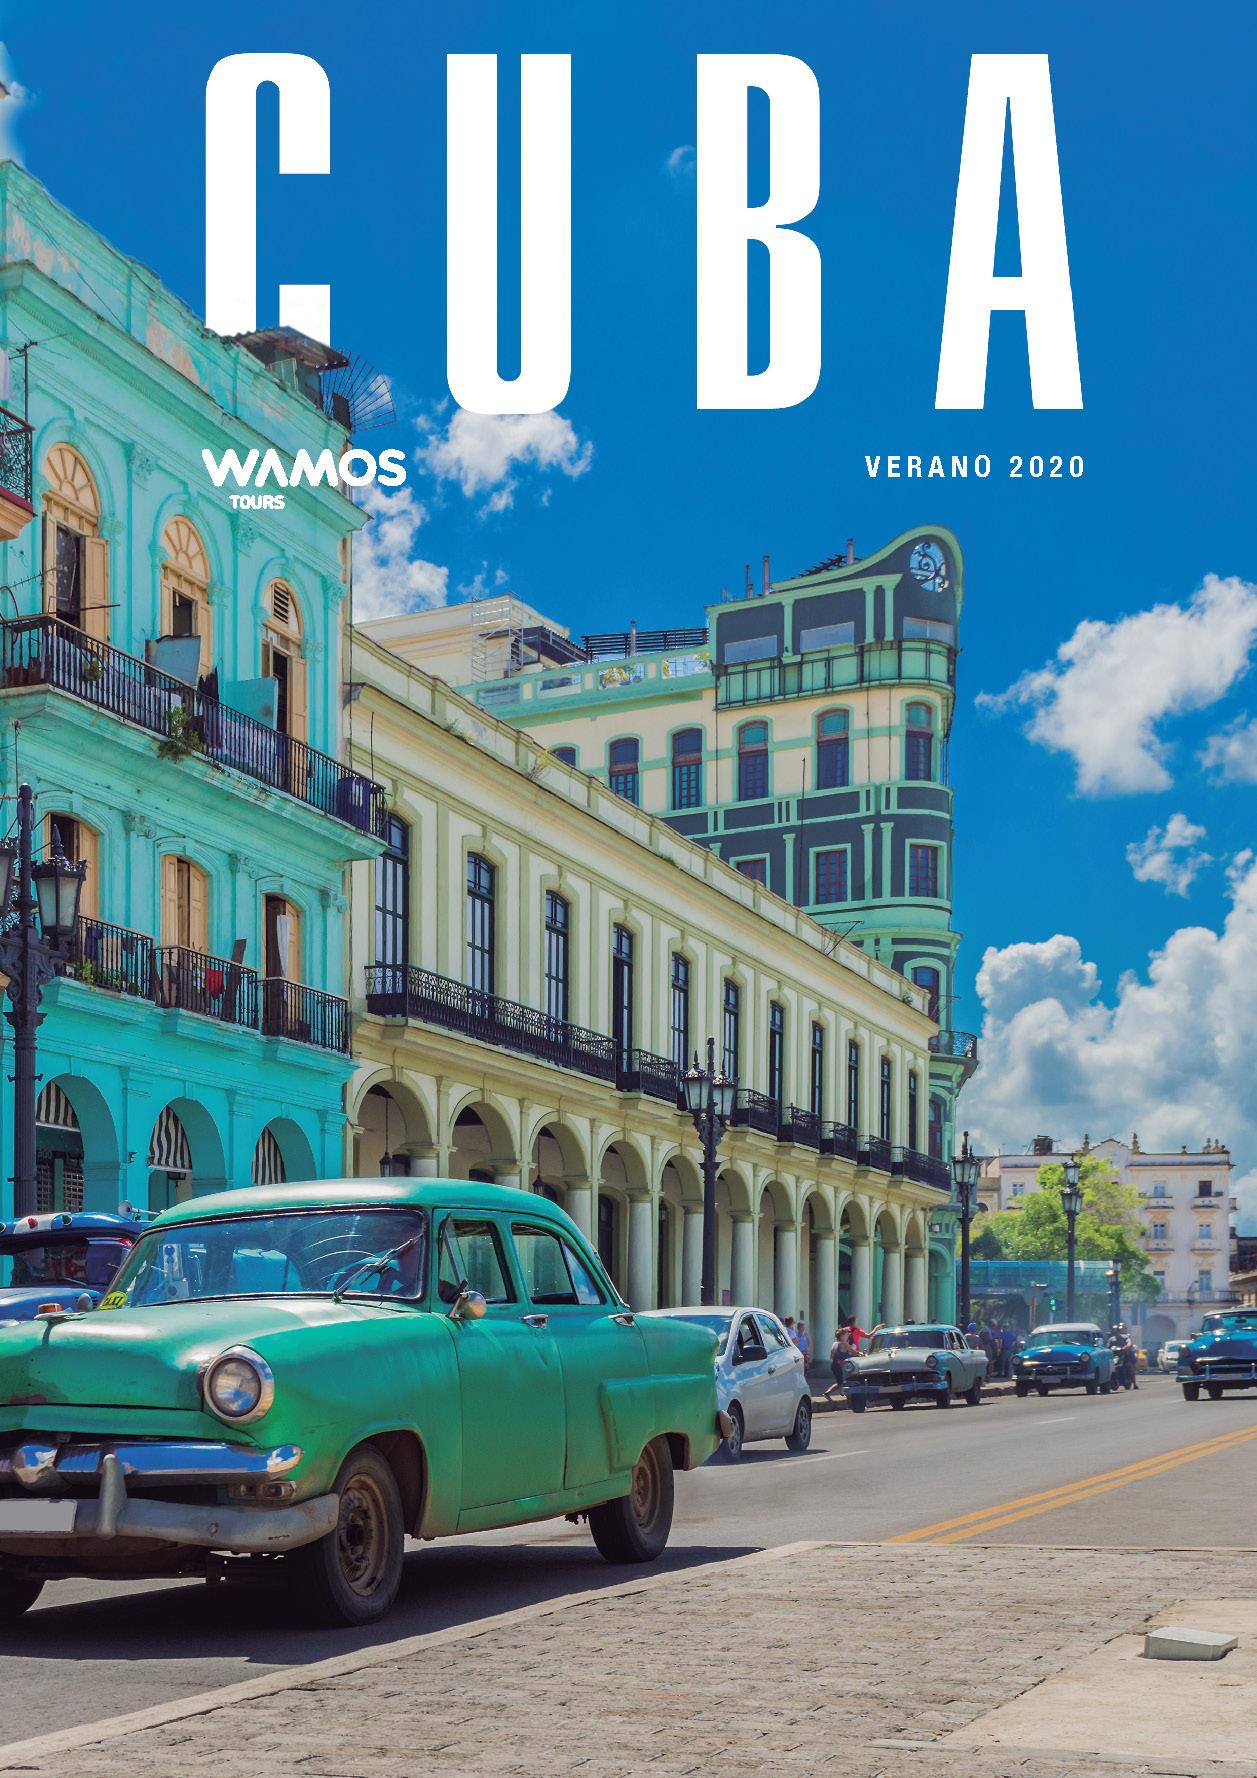 Catalogo Wamos Tours Cuba Verano 2020